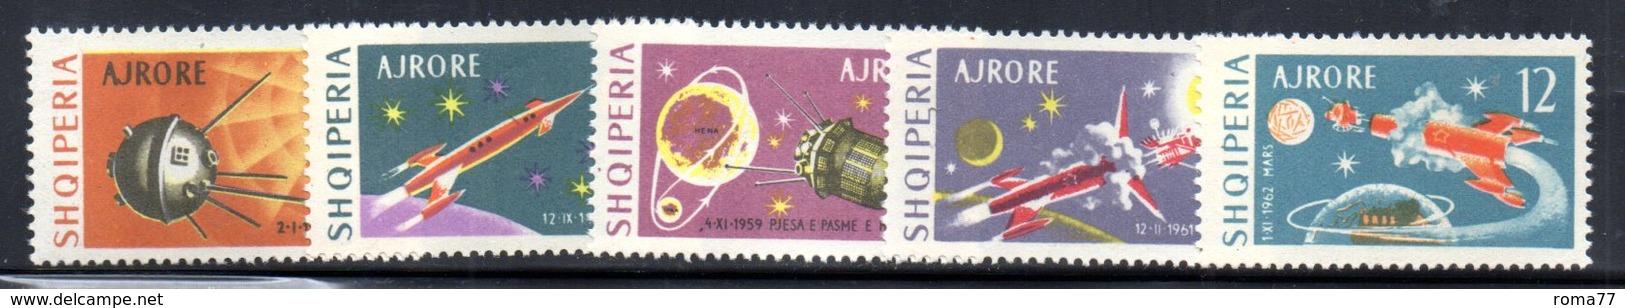 XP4043 - ALBANIA 1963 , Posta Aerea Yvert Serie N. 61/65  *  Cosmos - Albania